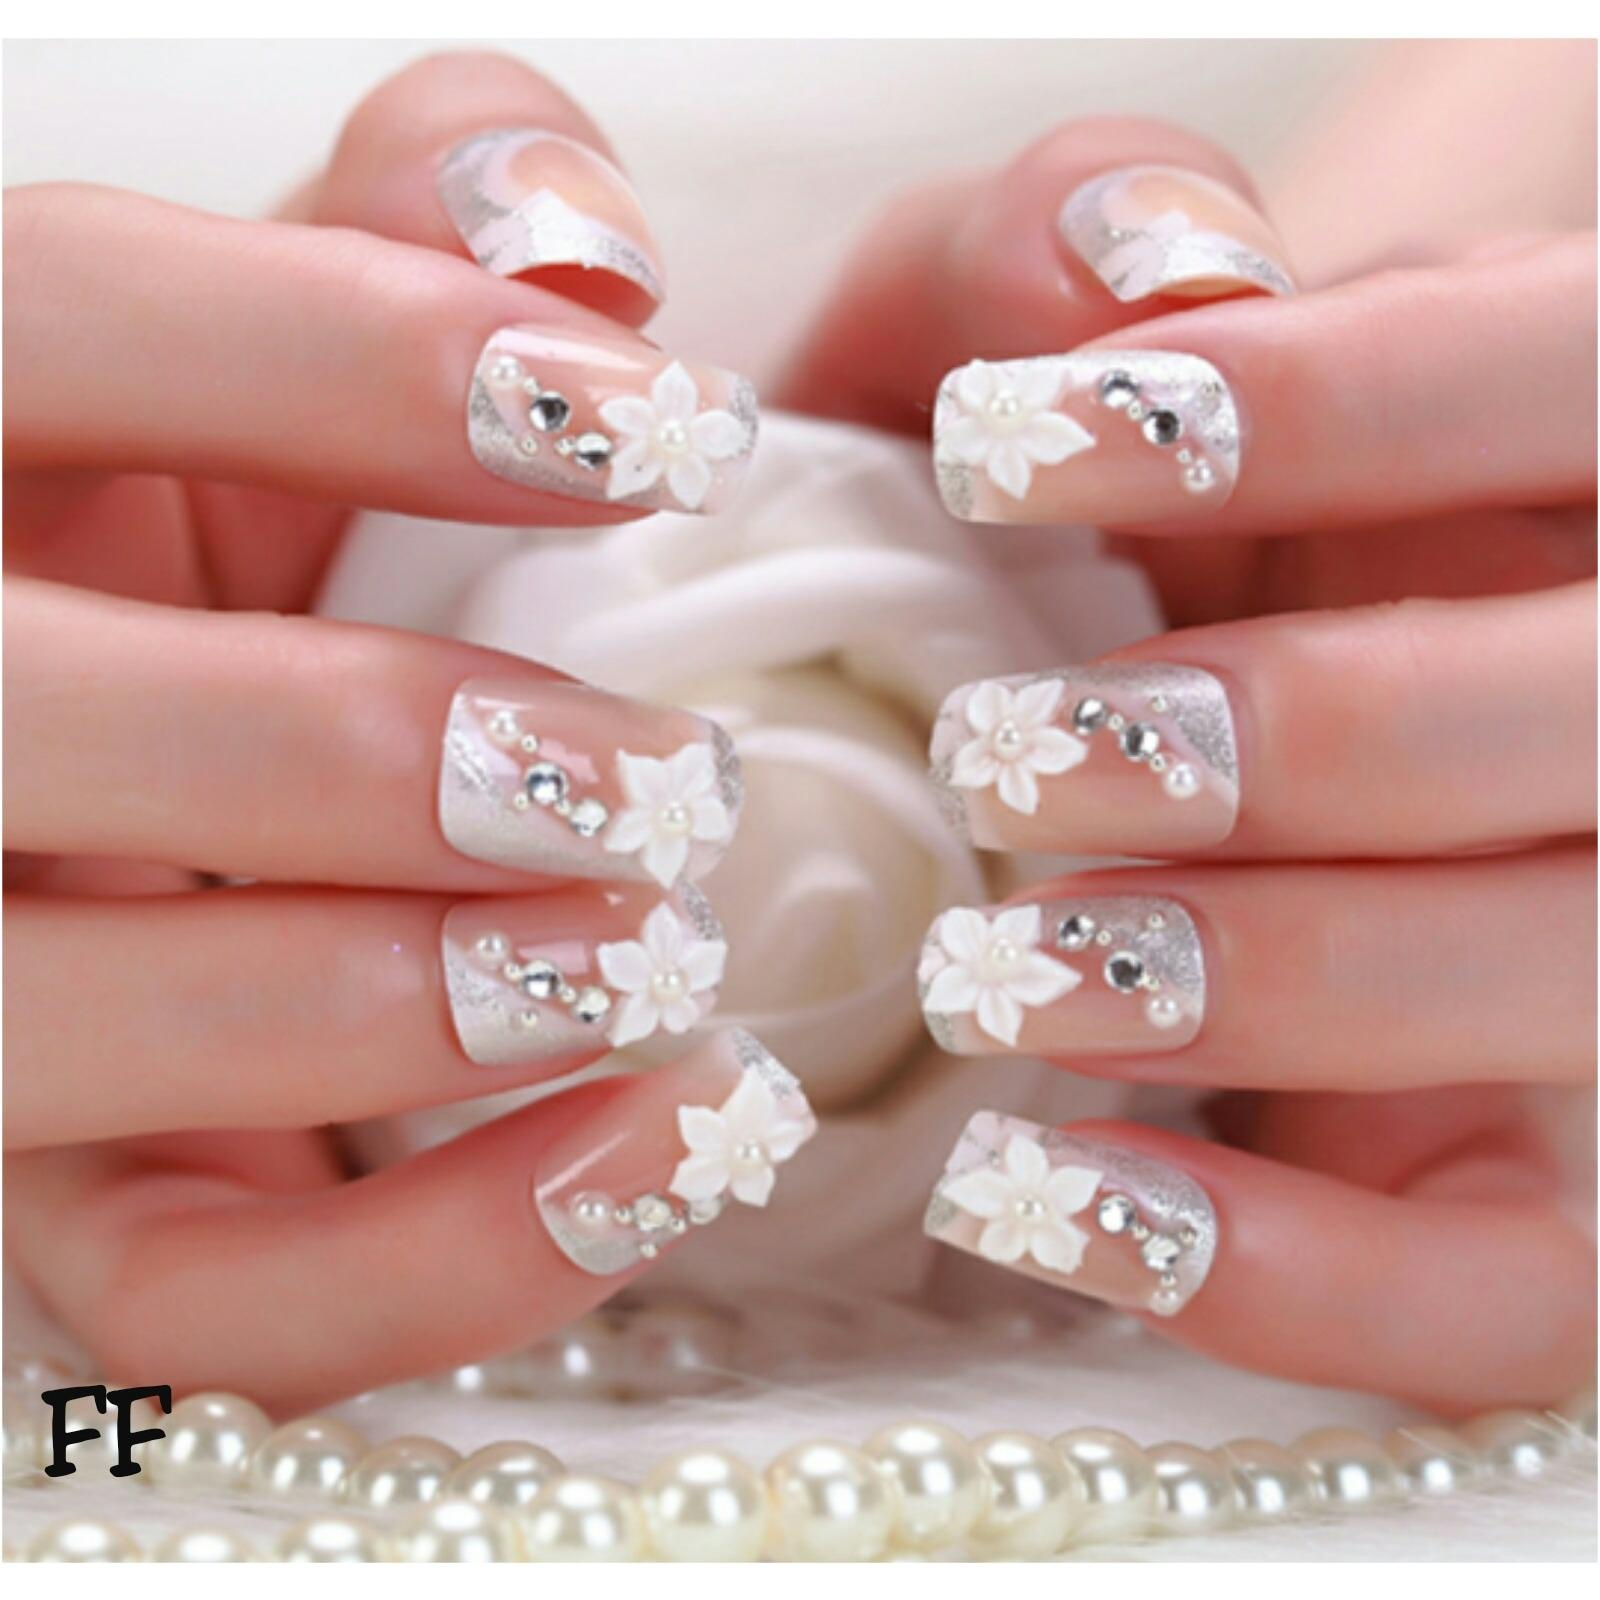 24 Buah French Nail Art Kuku Palsu Akrilik Tips Lengkap Berwarna Jbs Nails Wedding 3d A41 Ff Fake Pernikahan Aksesoris Hiasan Pengantin